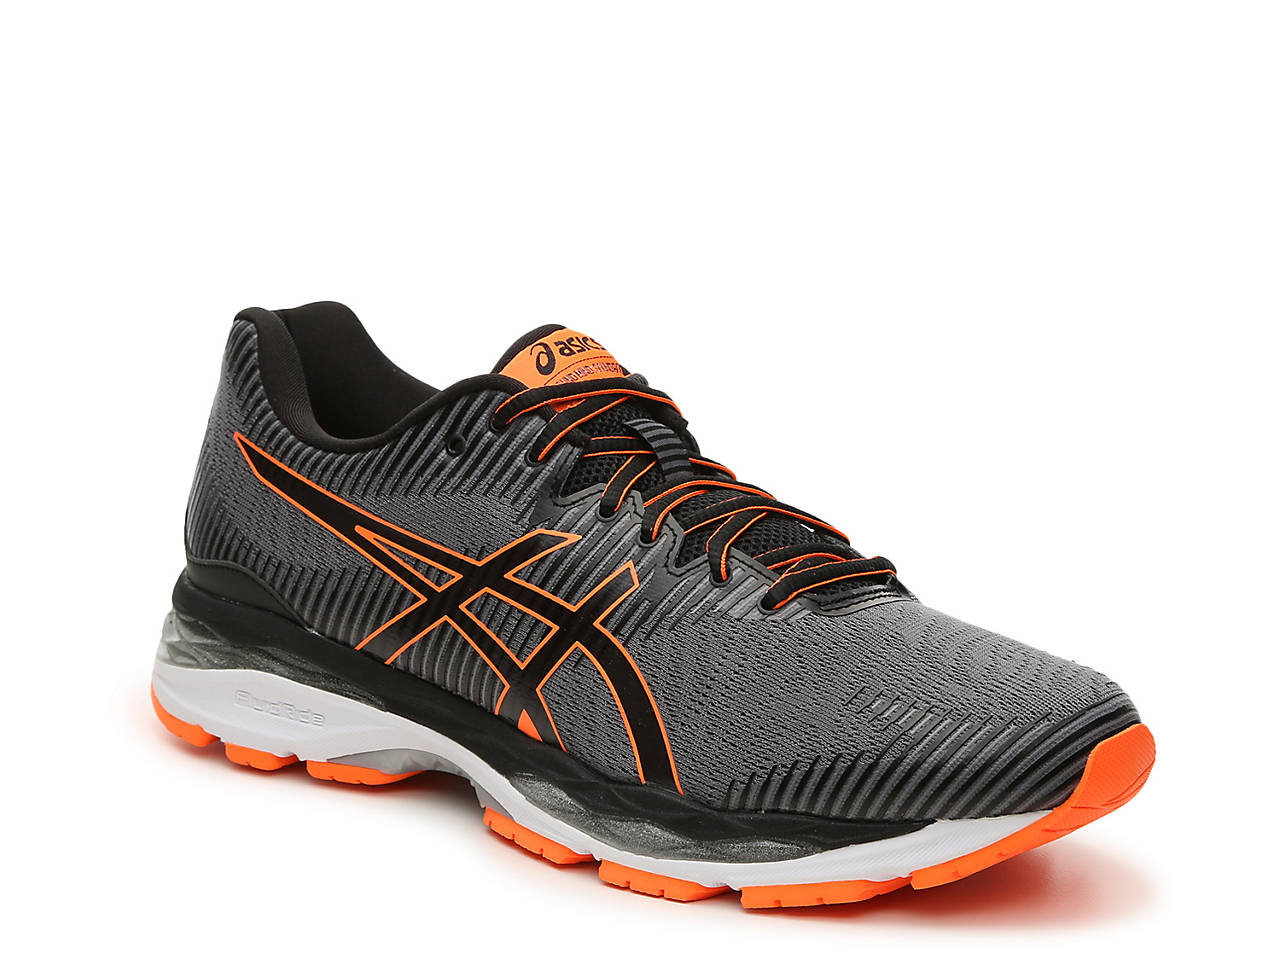 Asics Shoes 2 Running Men's Shoe Gel Ziruss Dsw 8xwPYr8qE